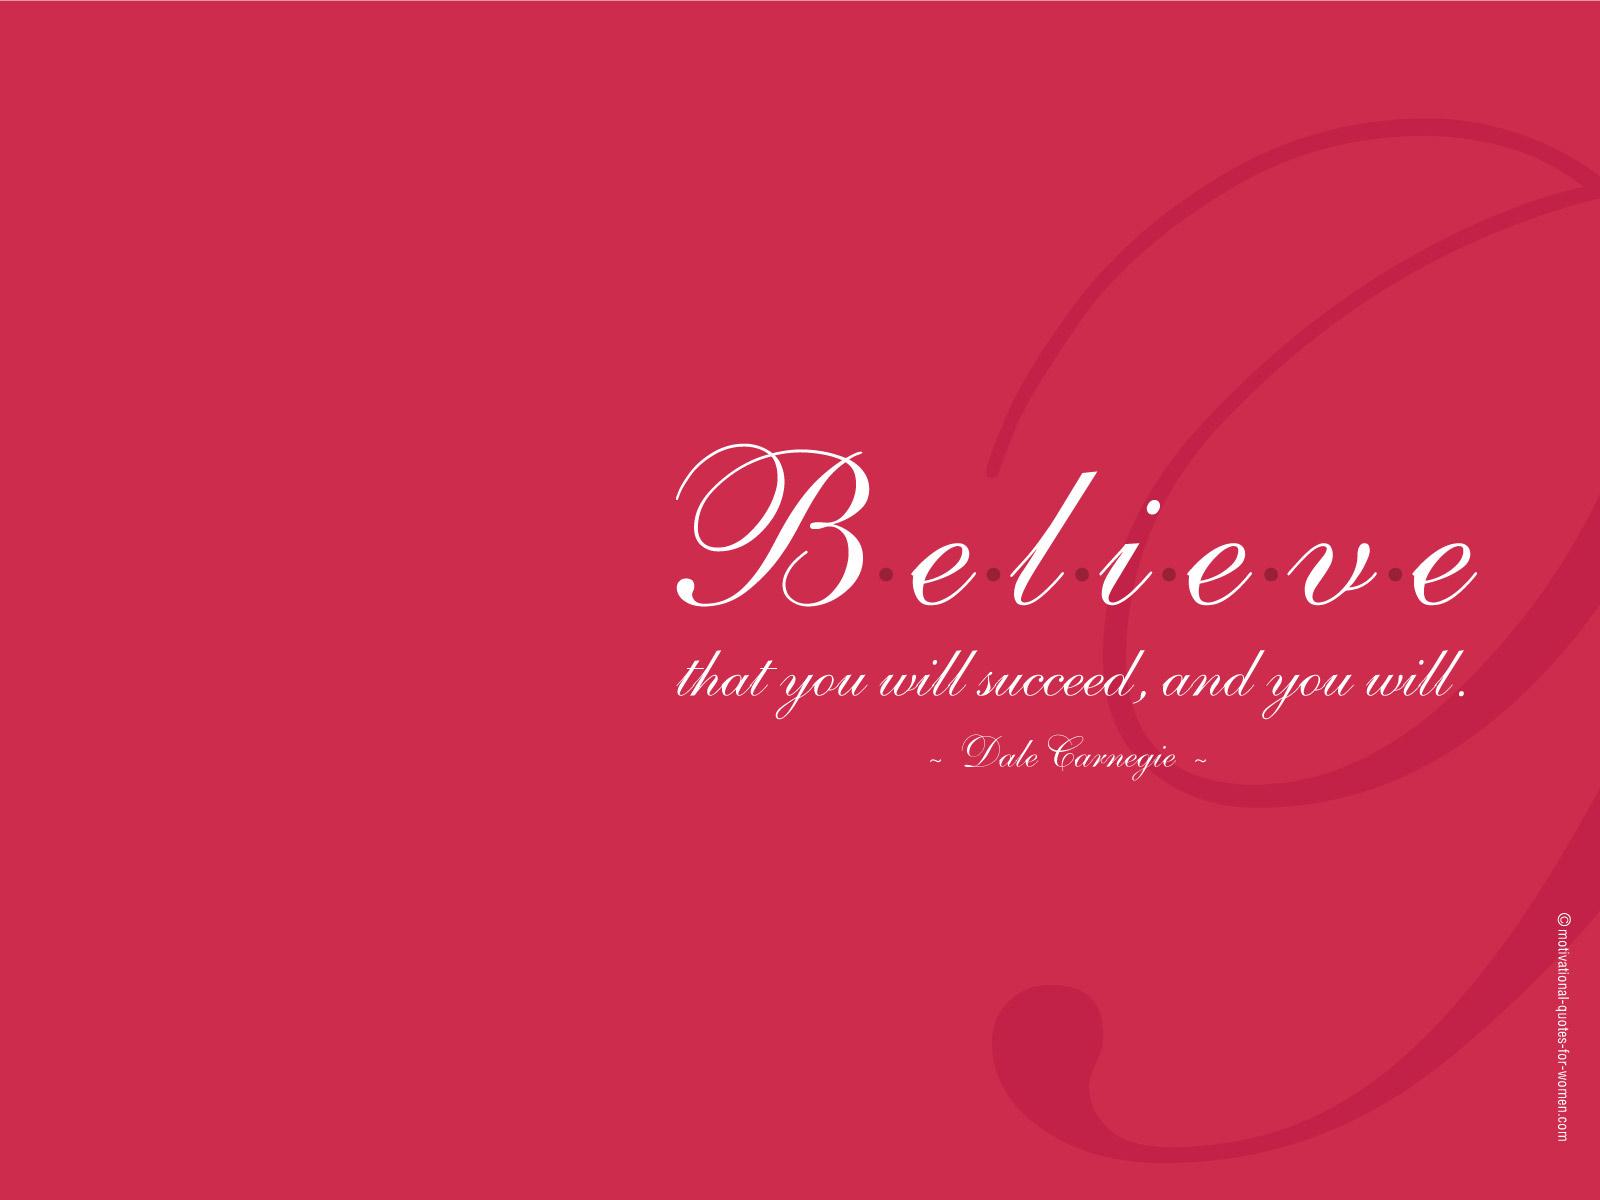 Inspirational Motivational Quotes Desktop Wallpaper QuotesGram 1600x1200